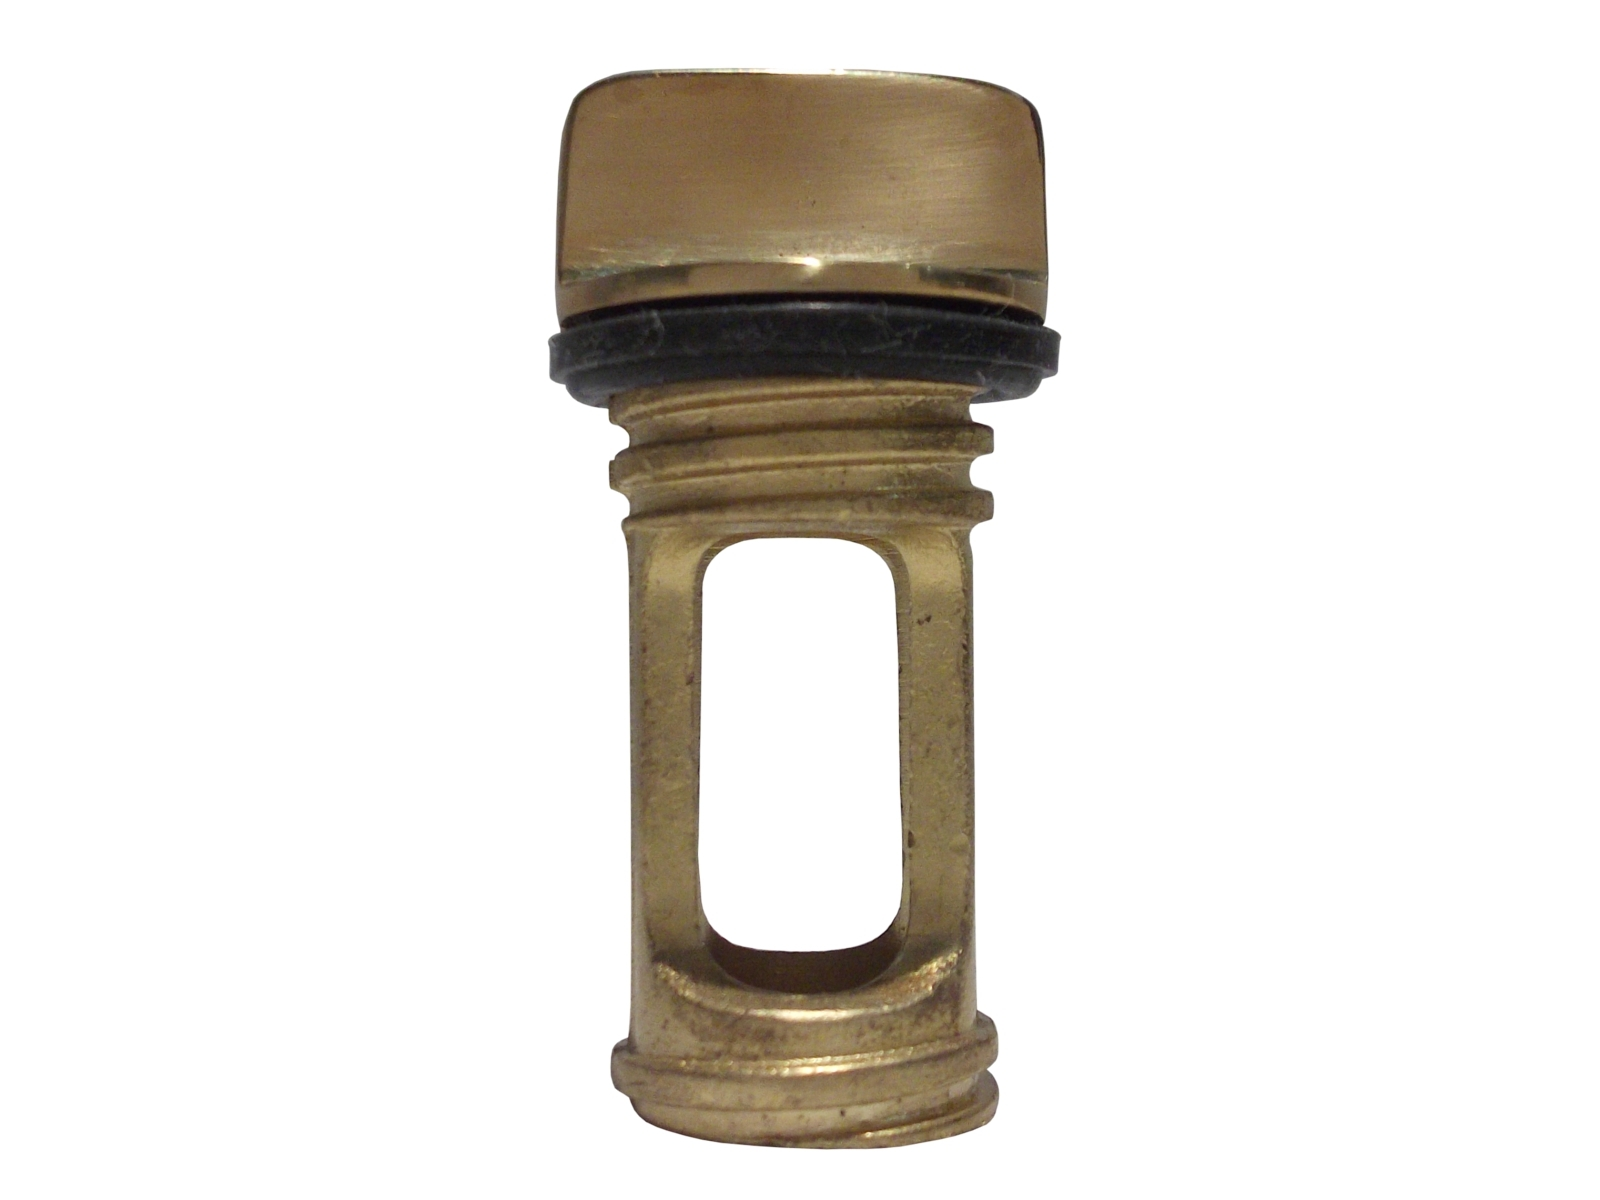 M716991052801 Southco 12 Garboard Drain Plug Brass